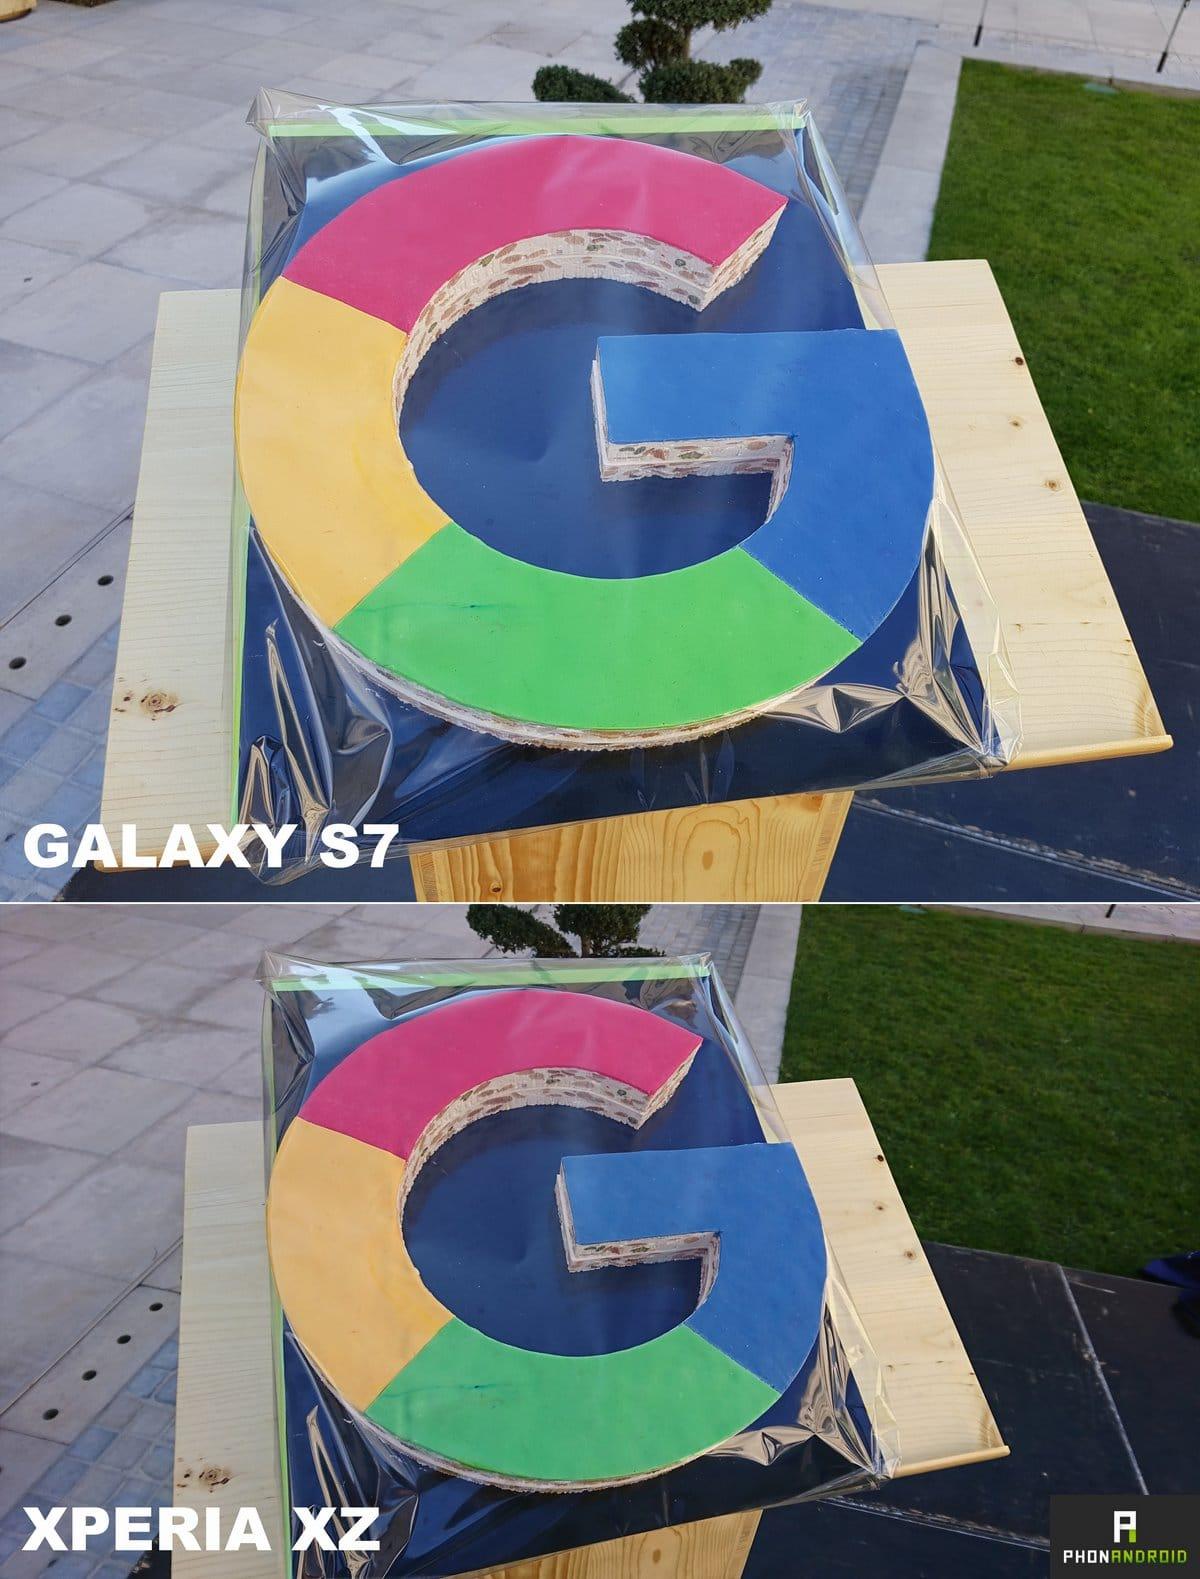 sony-xperia-xz-versus-galaxy-s7